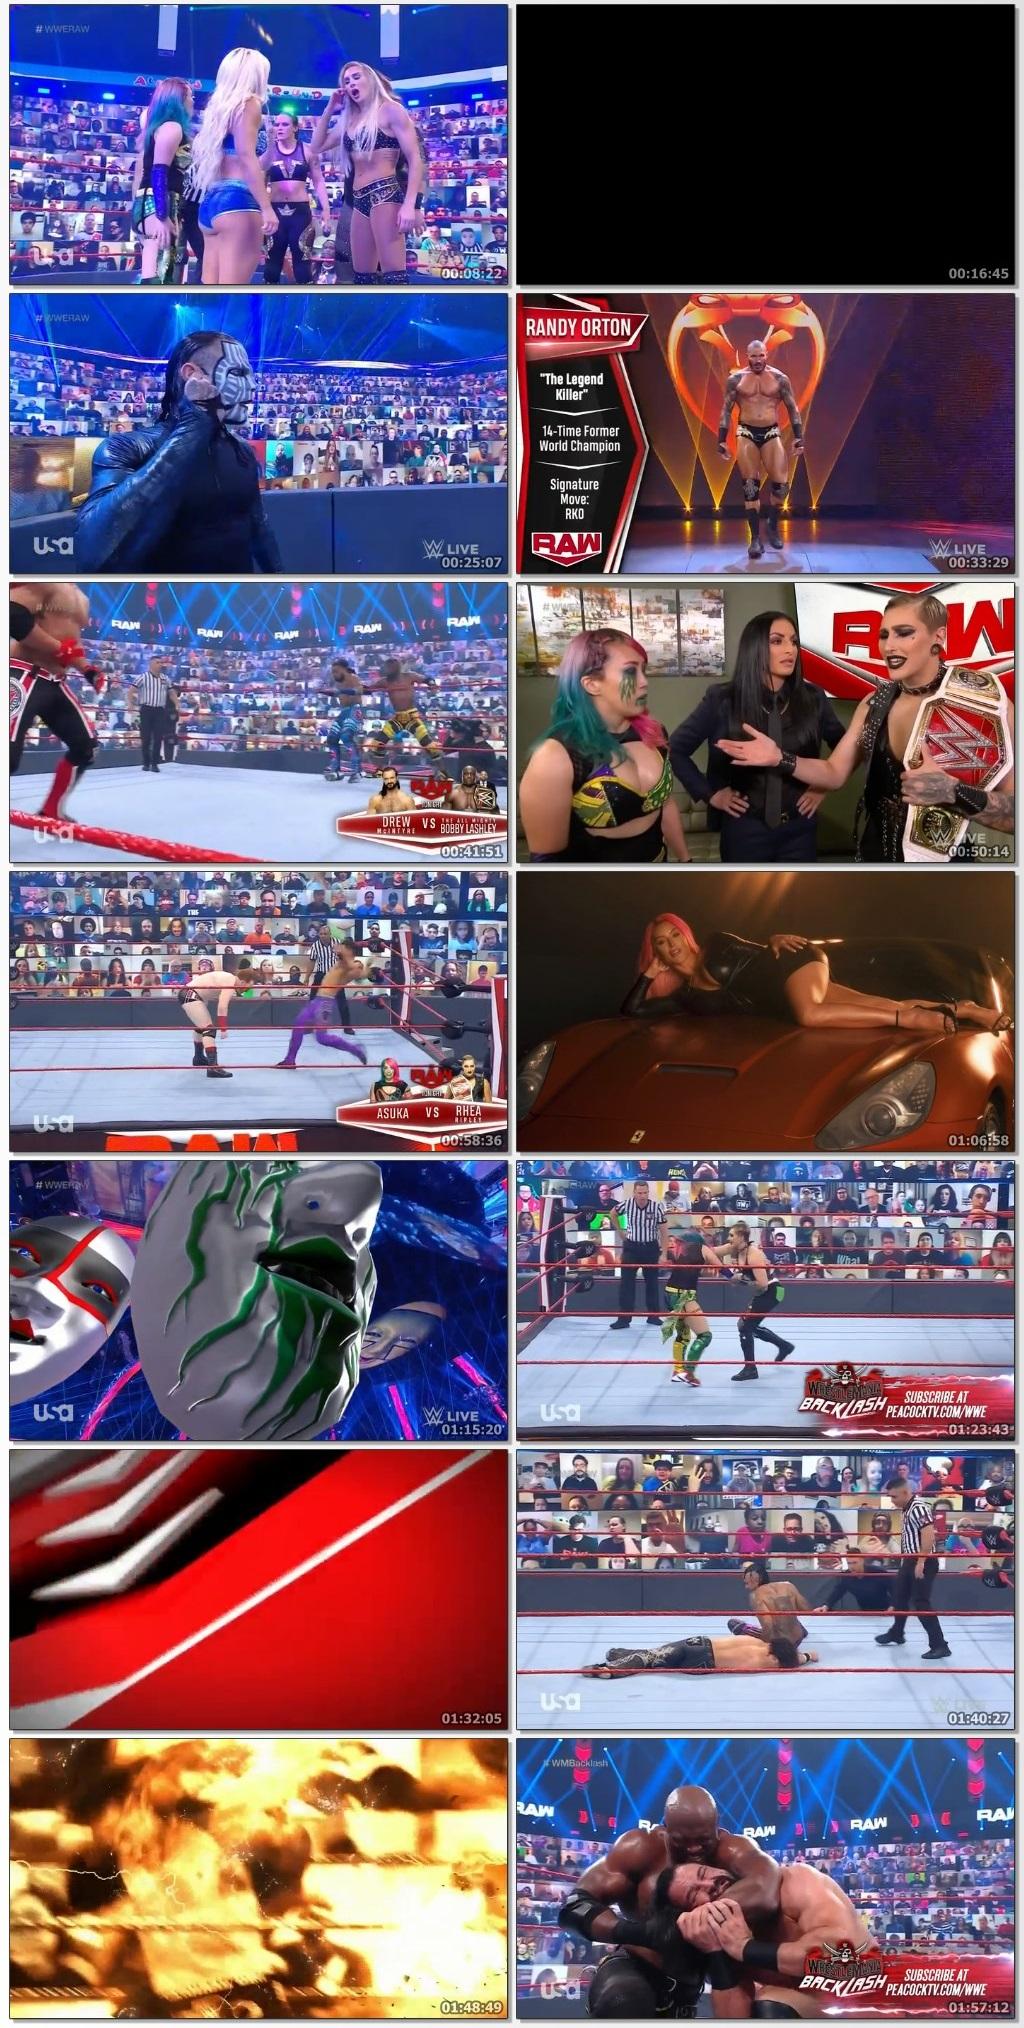 WWE-Monday-Night-Raw-10th-May-2021-www-1kmovies-cyou-English-720p-HDTV-1-4-GB-mkv-thumbs